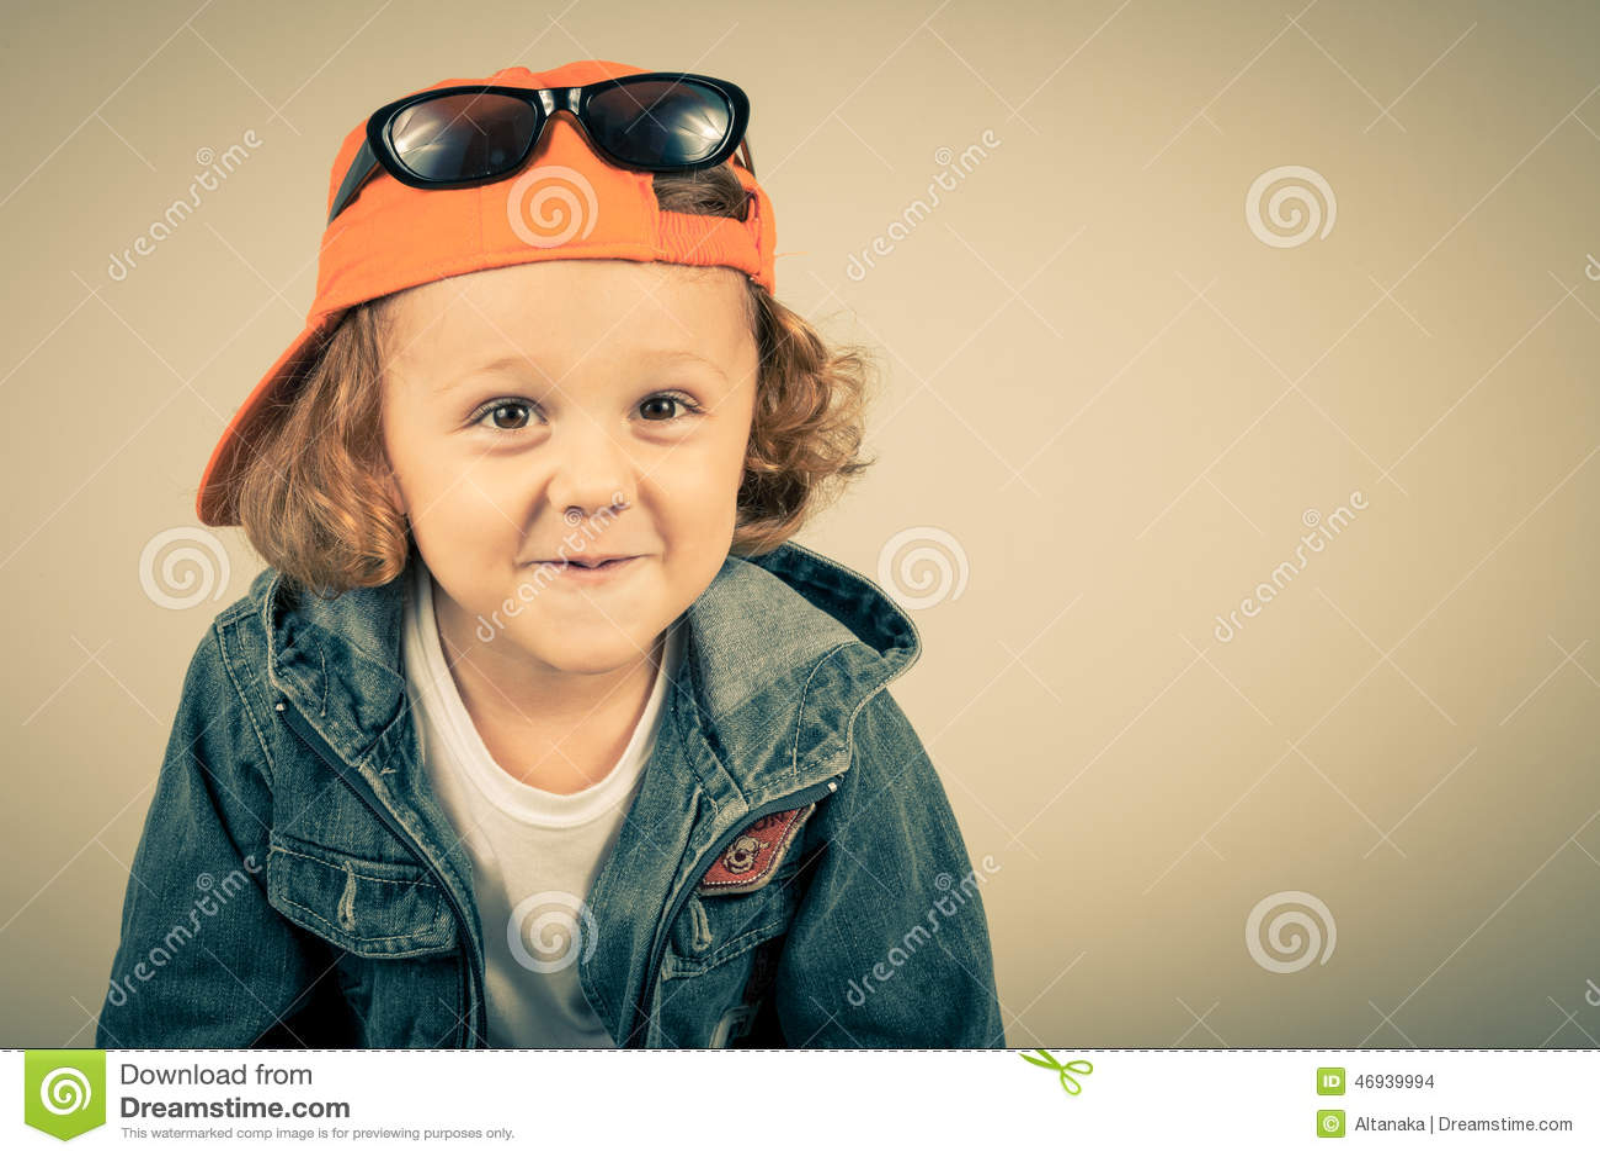 Fashion child. Happy boy model